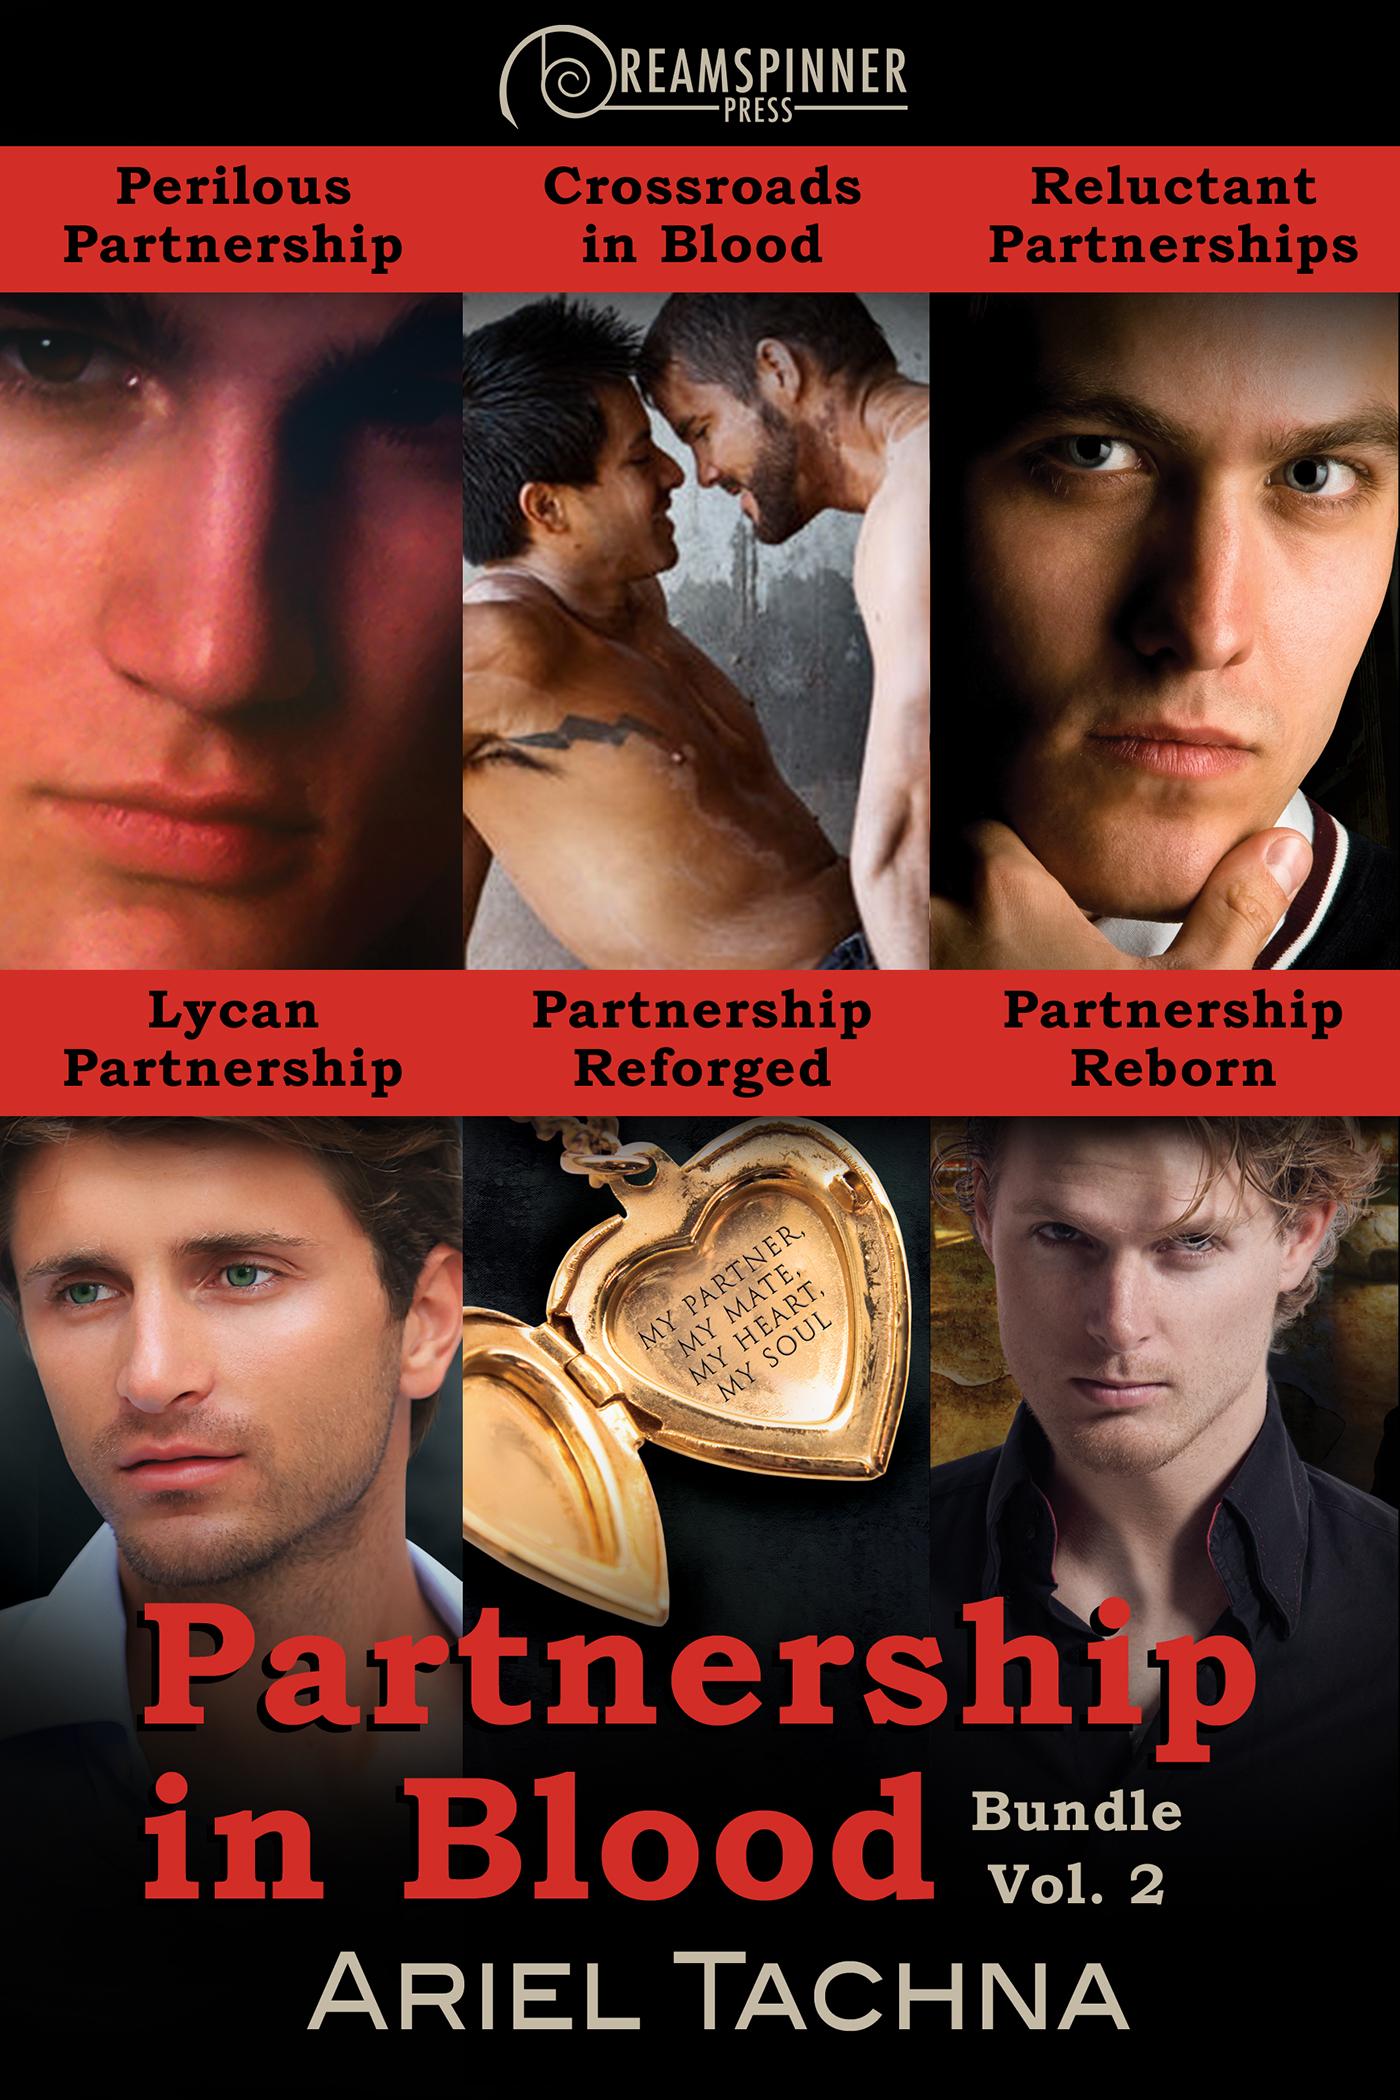 Partnership in Blood Bundle Vol. 2